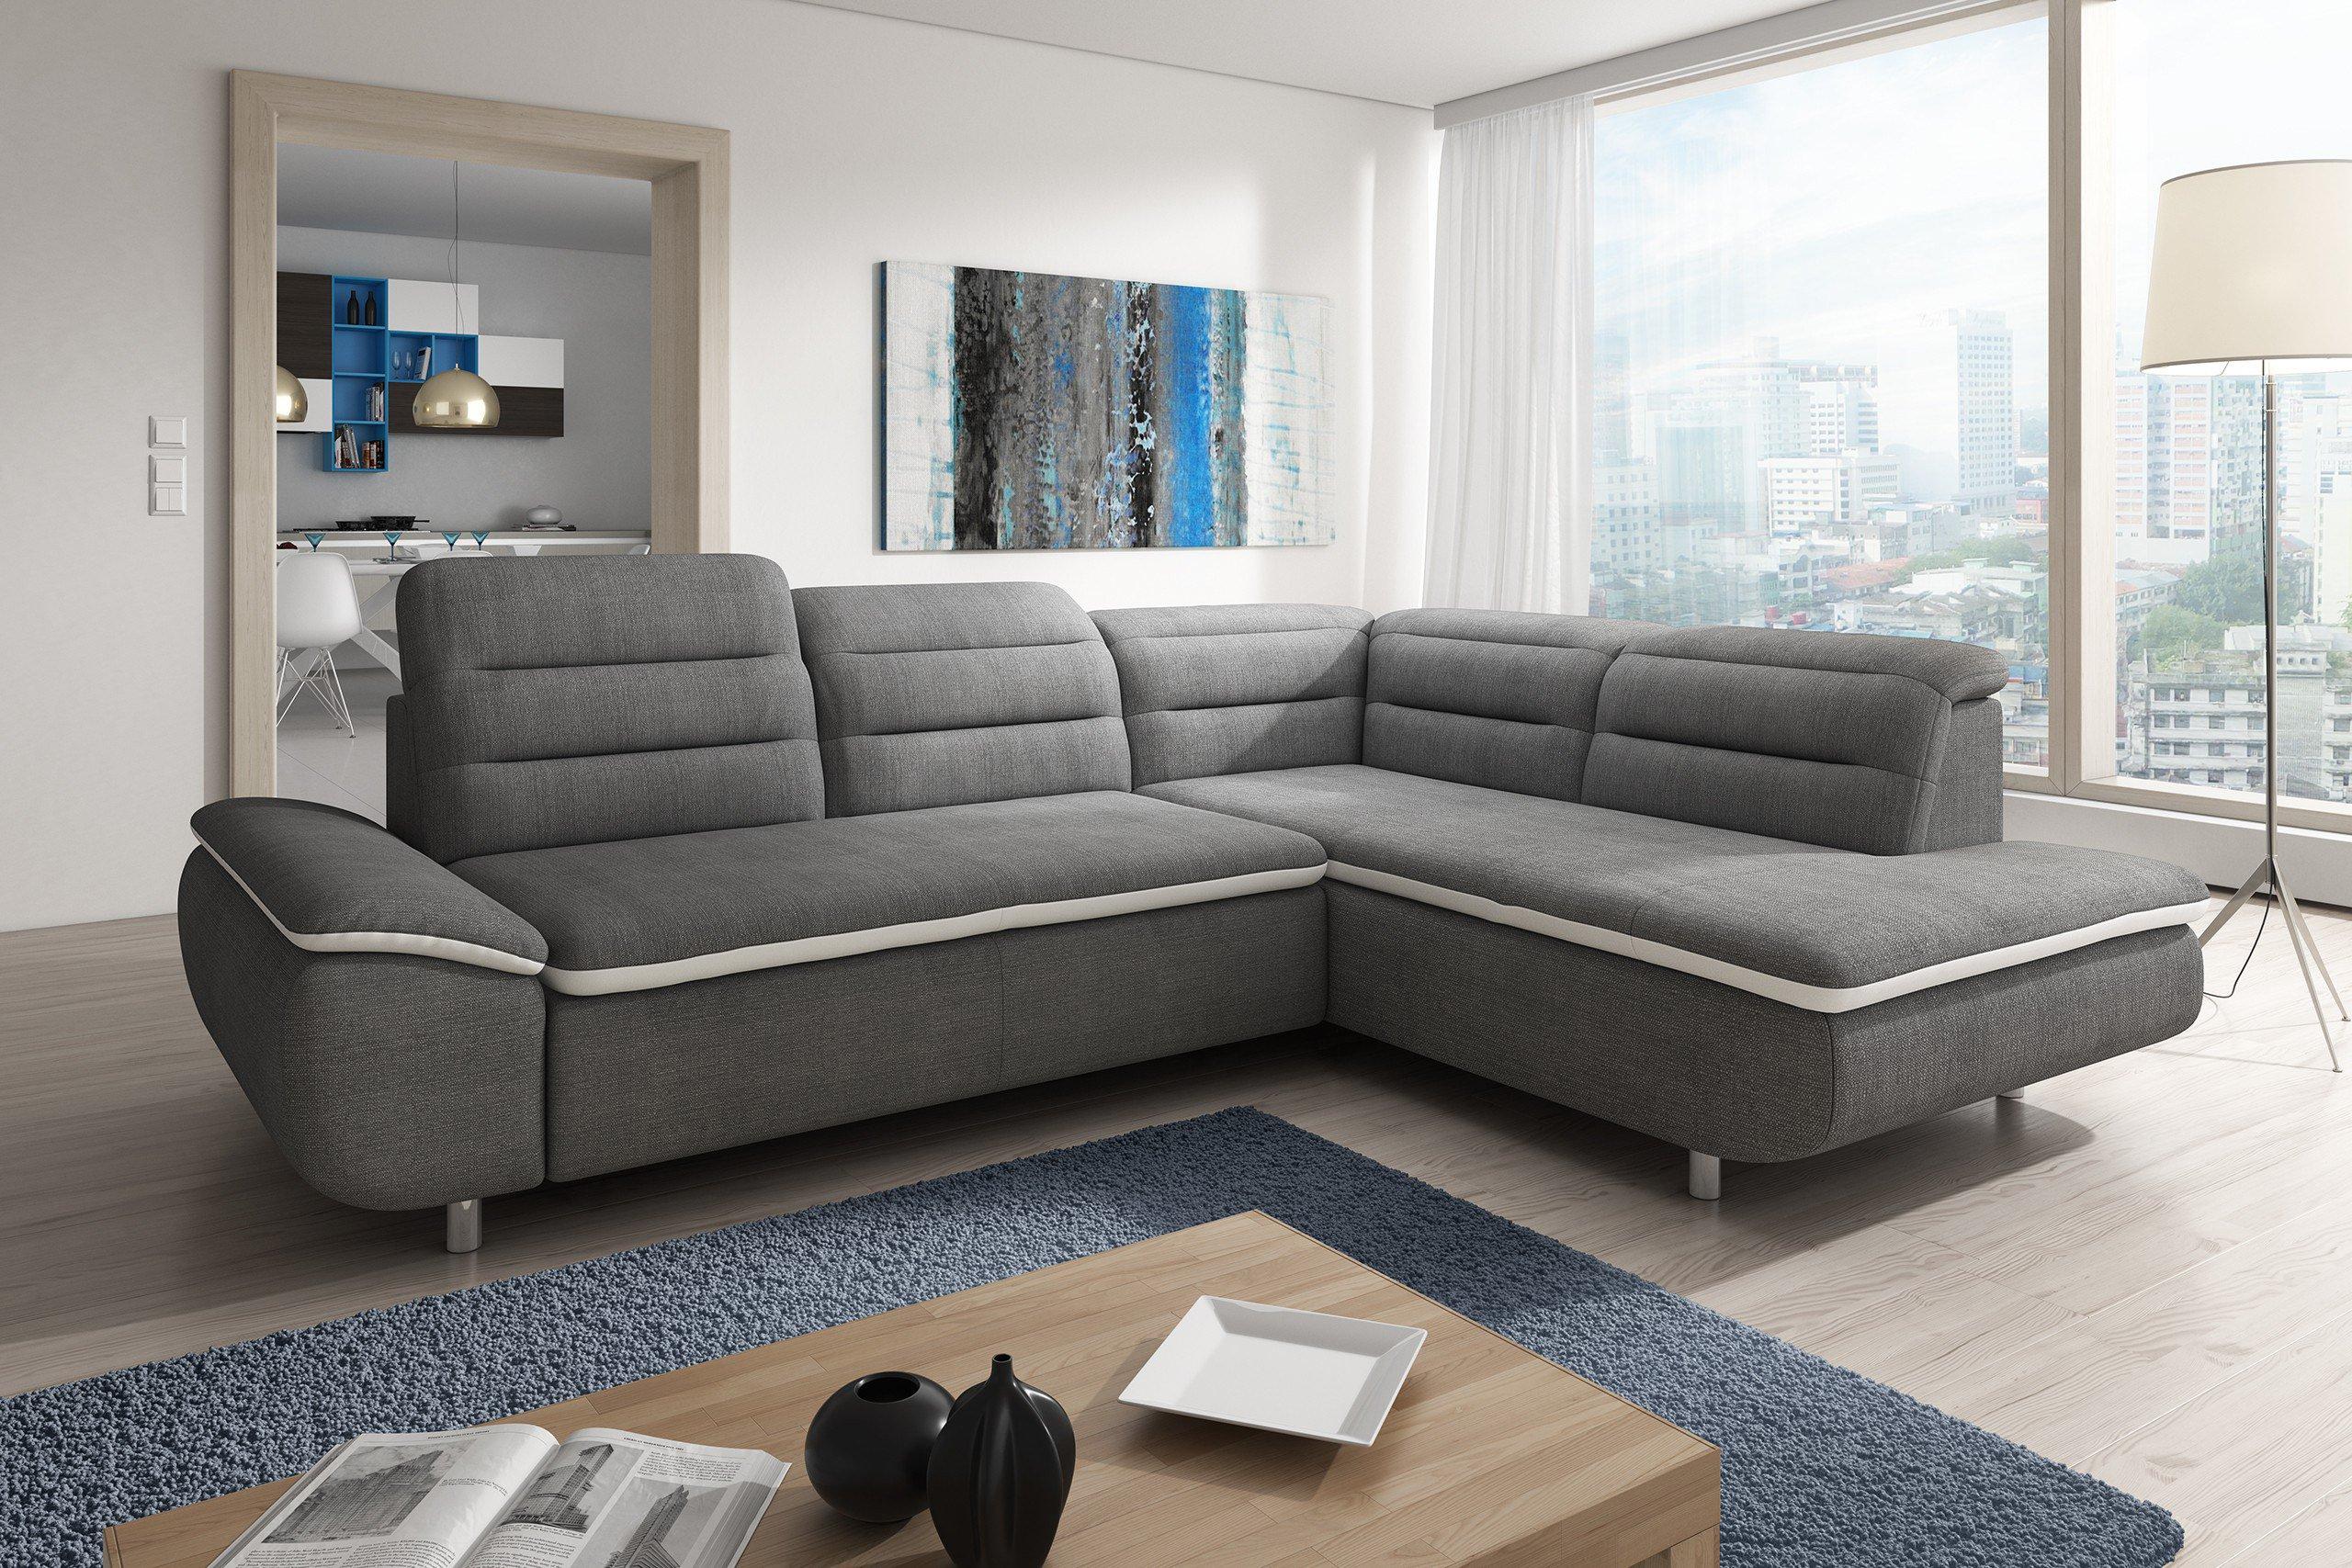 new look m bel slize eckcouch in grau m bel letz ihr online shop. Black Bedroom Furniture Sets. Home Design Ideas